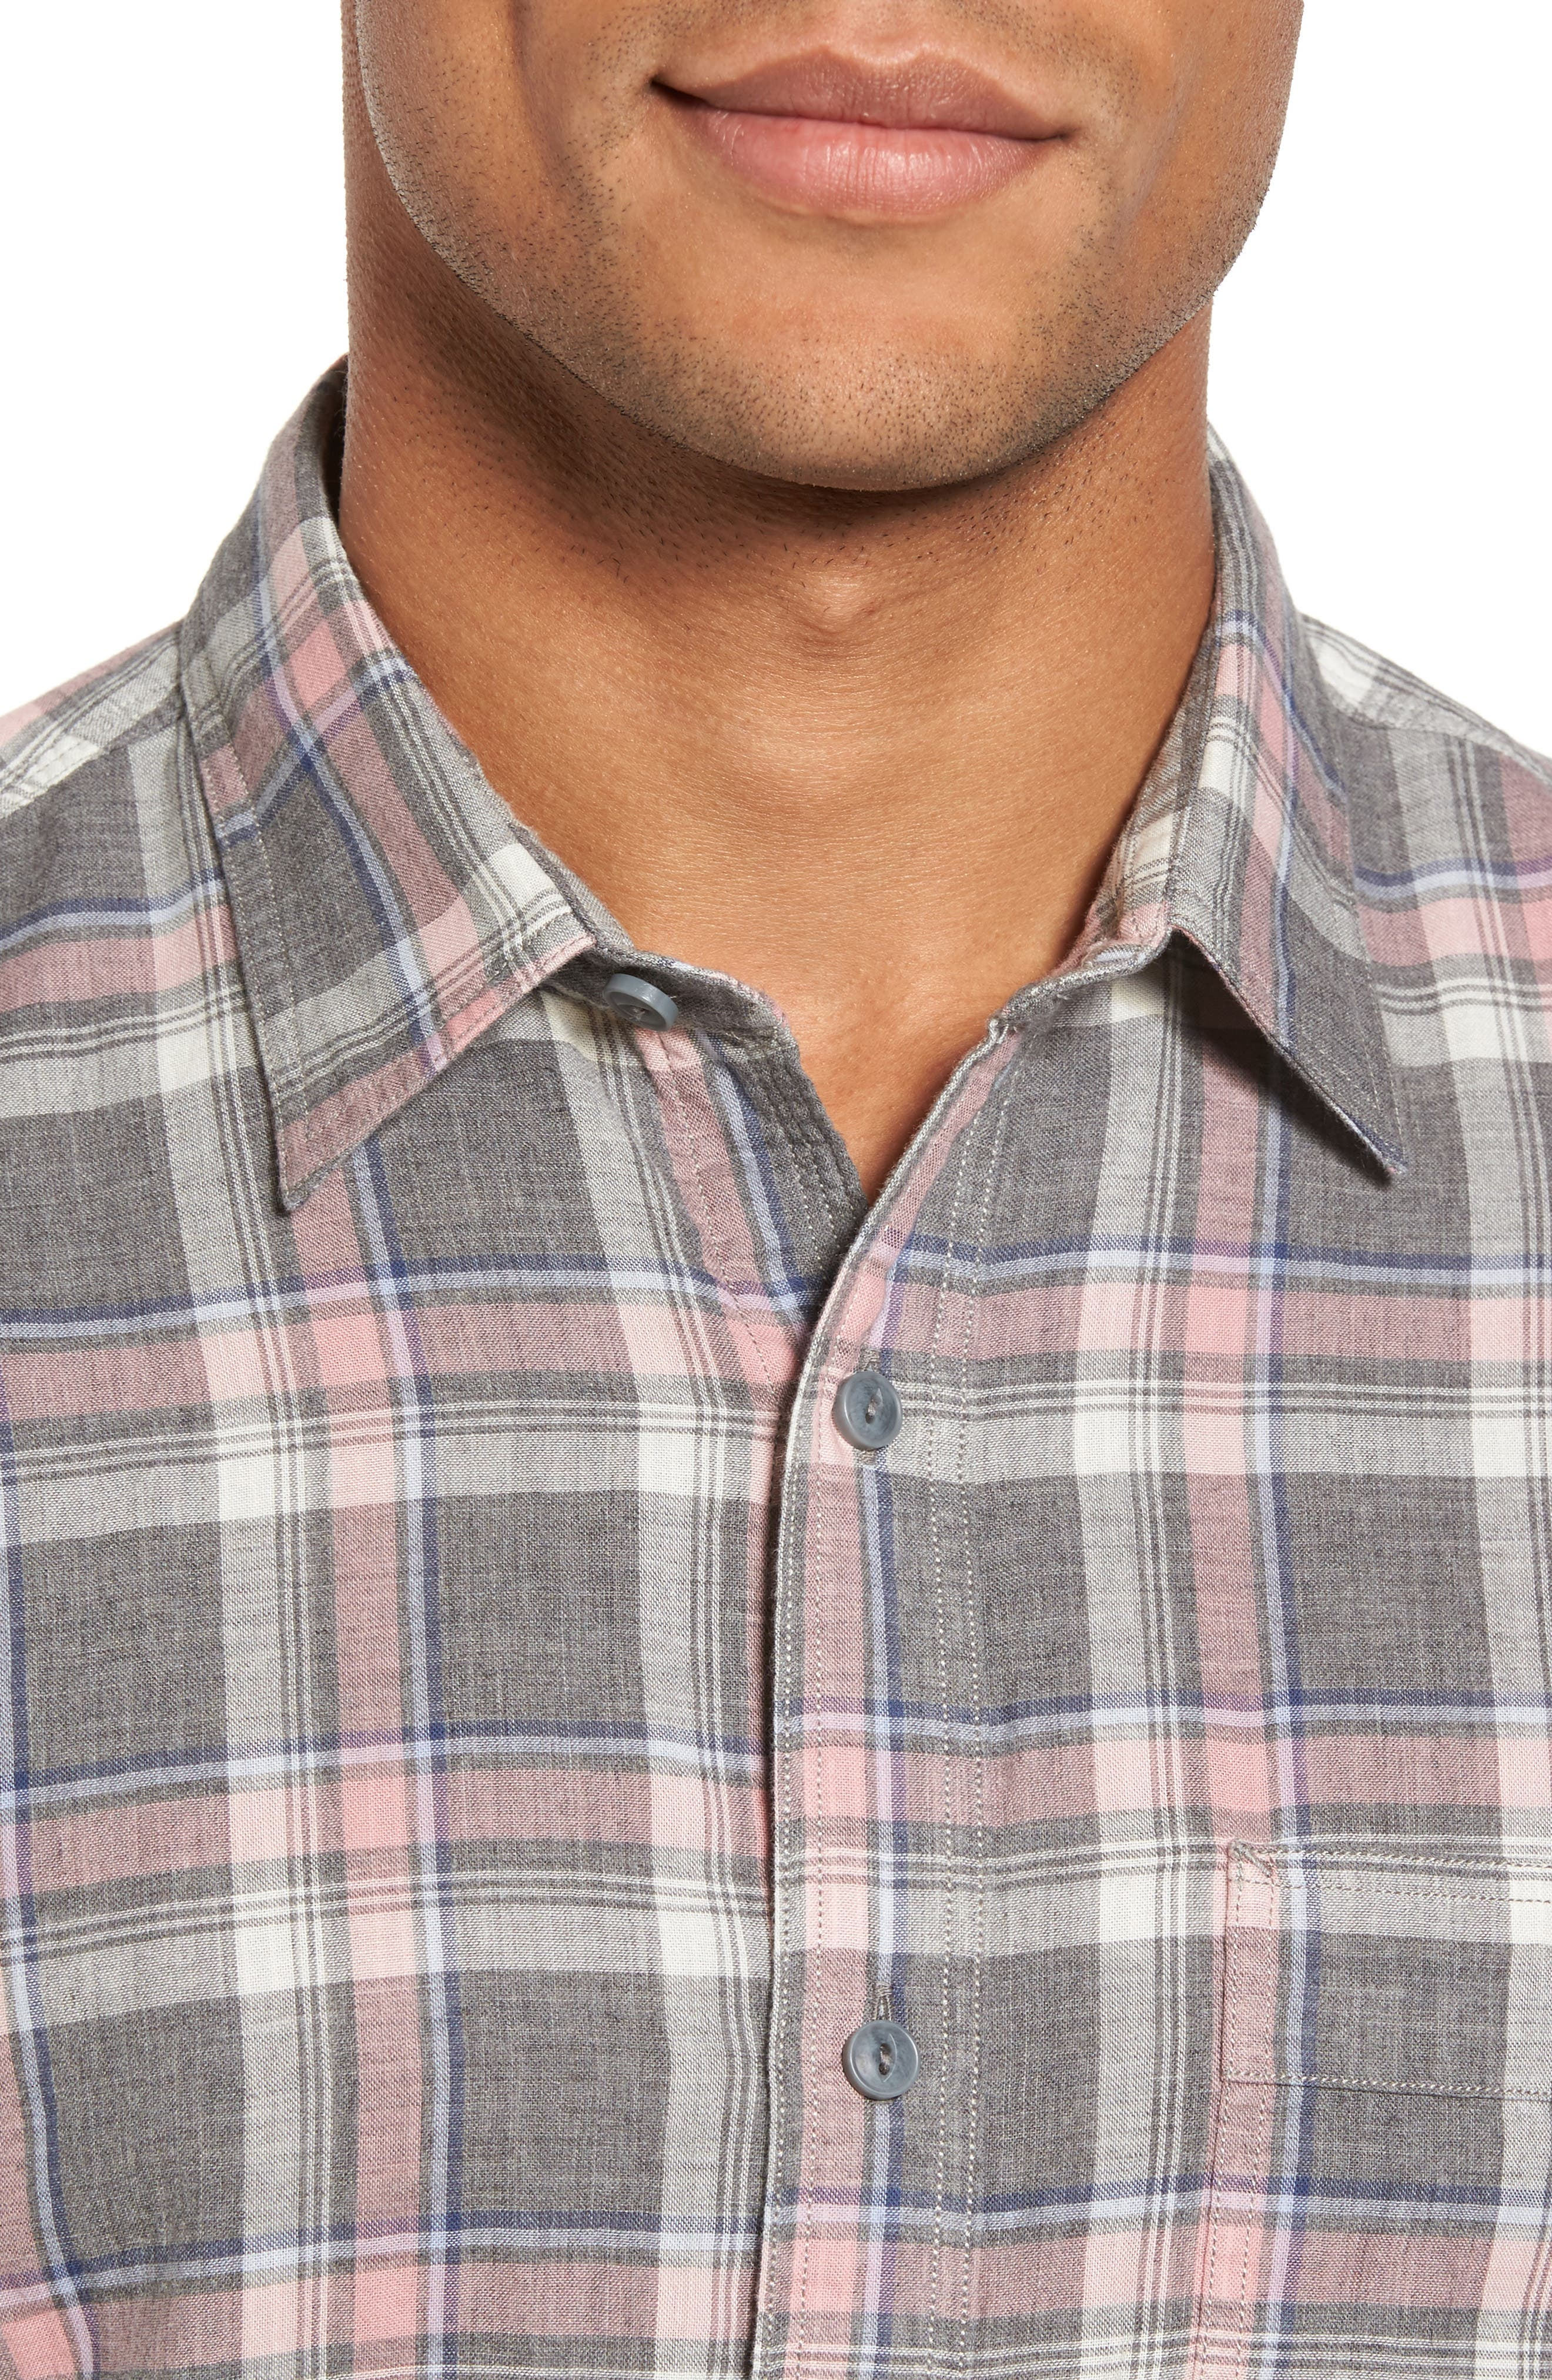 Trim Fit Utility Duofold Sport Shirt,                             Alternate thumbnail 4, color,                             Grey Paloma Pink Plaid Duofold